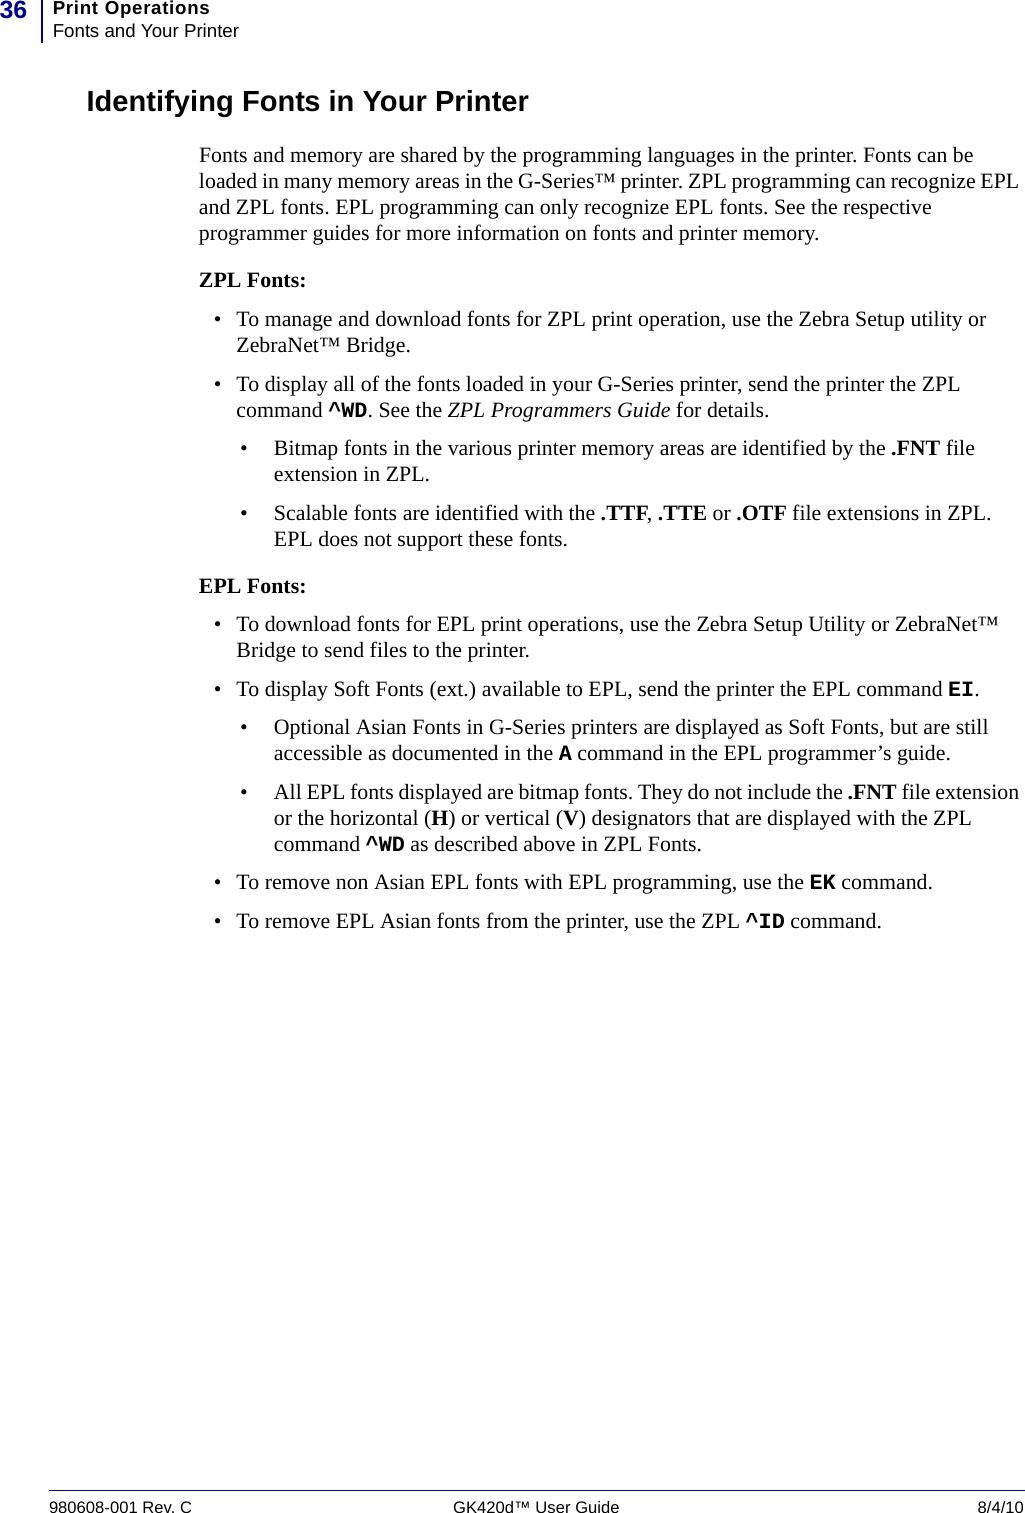 How To Print Zebra Zpl Files